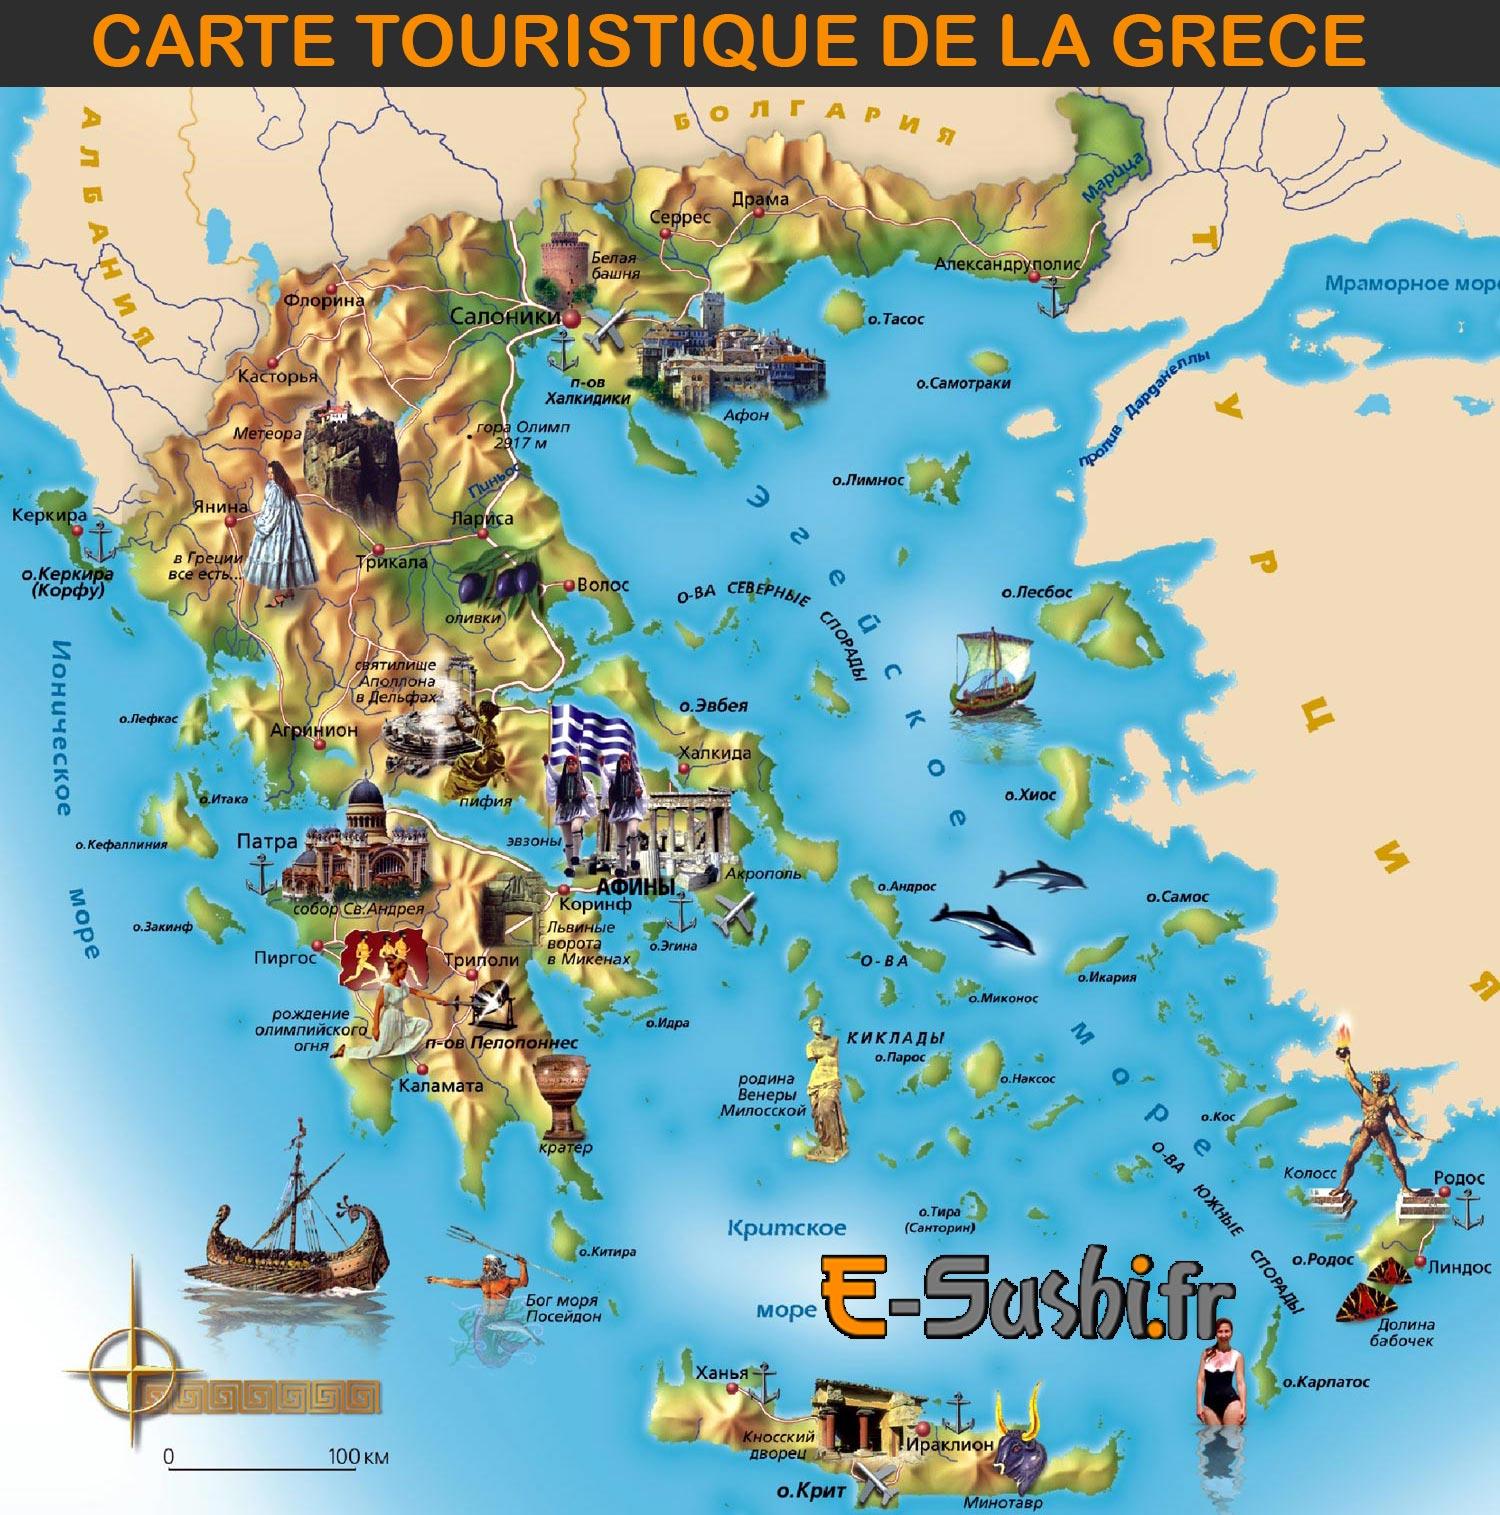 Carte - Grèce touristique